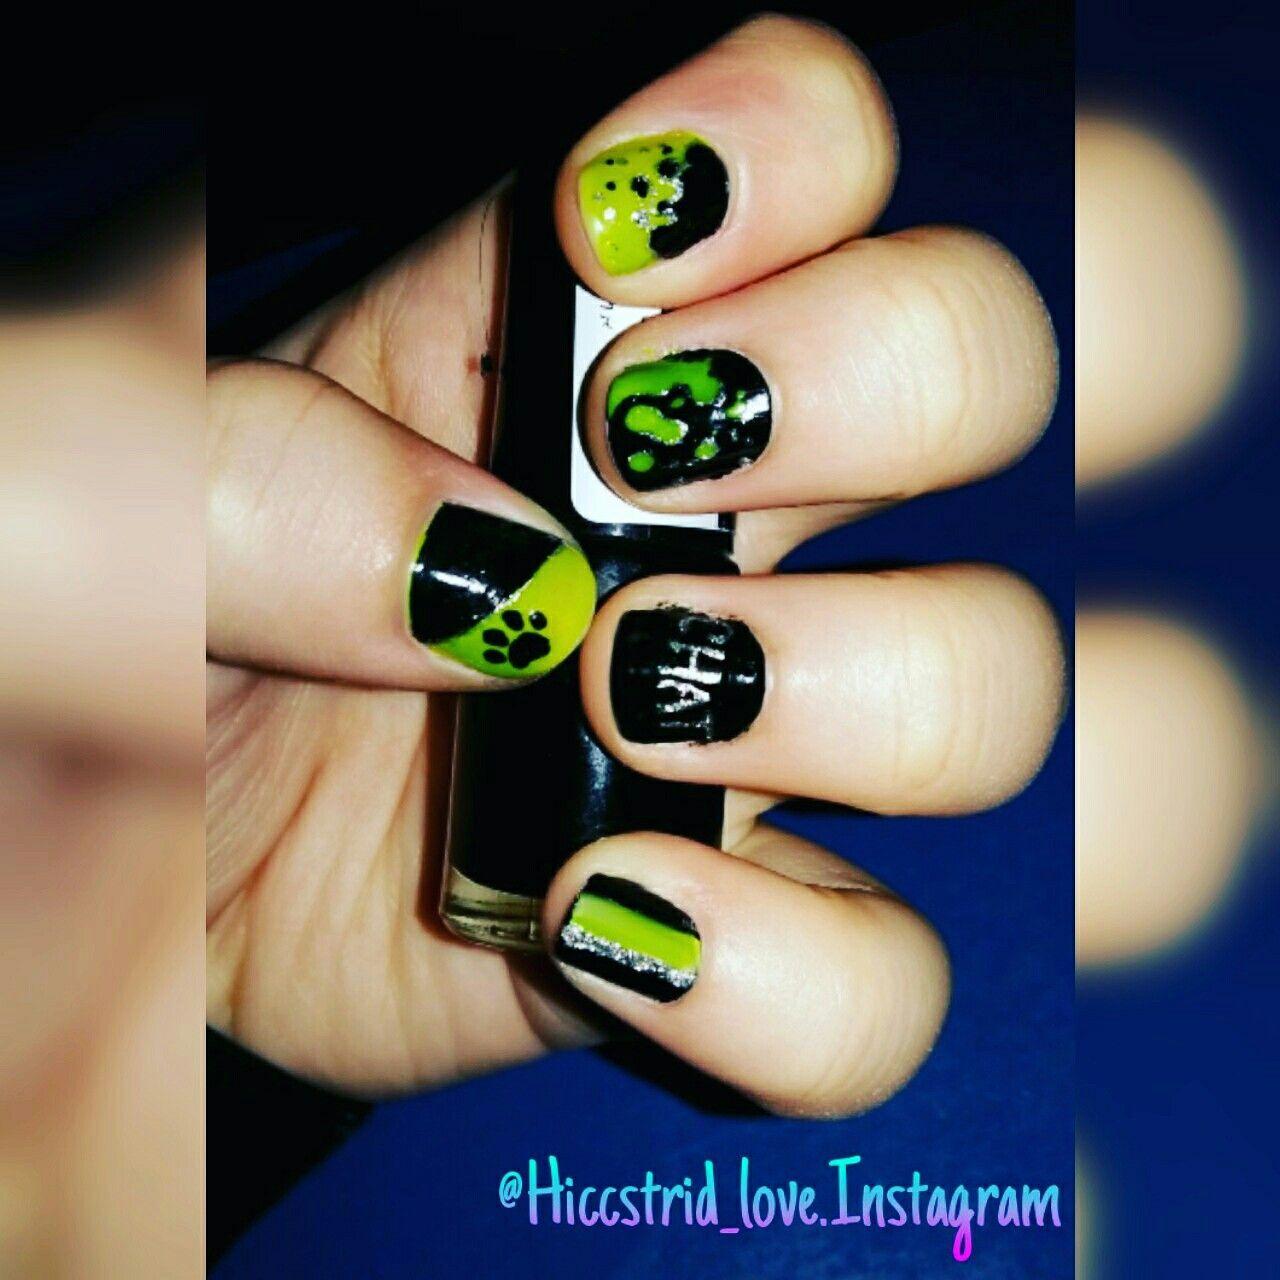 Miraculous ladybug nail art chat noir nails pinterest ladybug nail art miraculous ladybug - Nail art chat ...